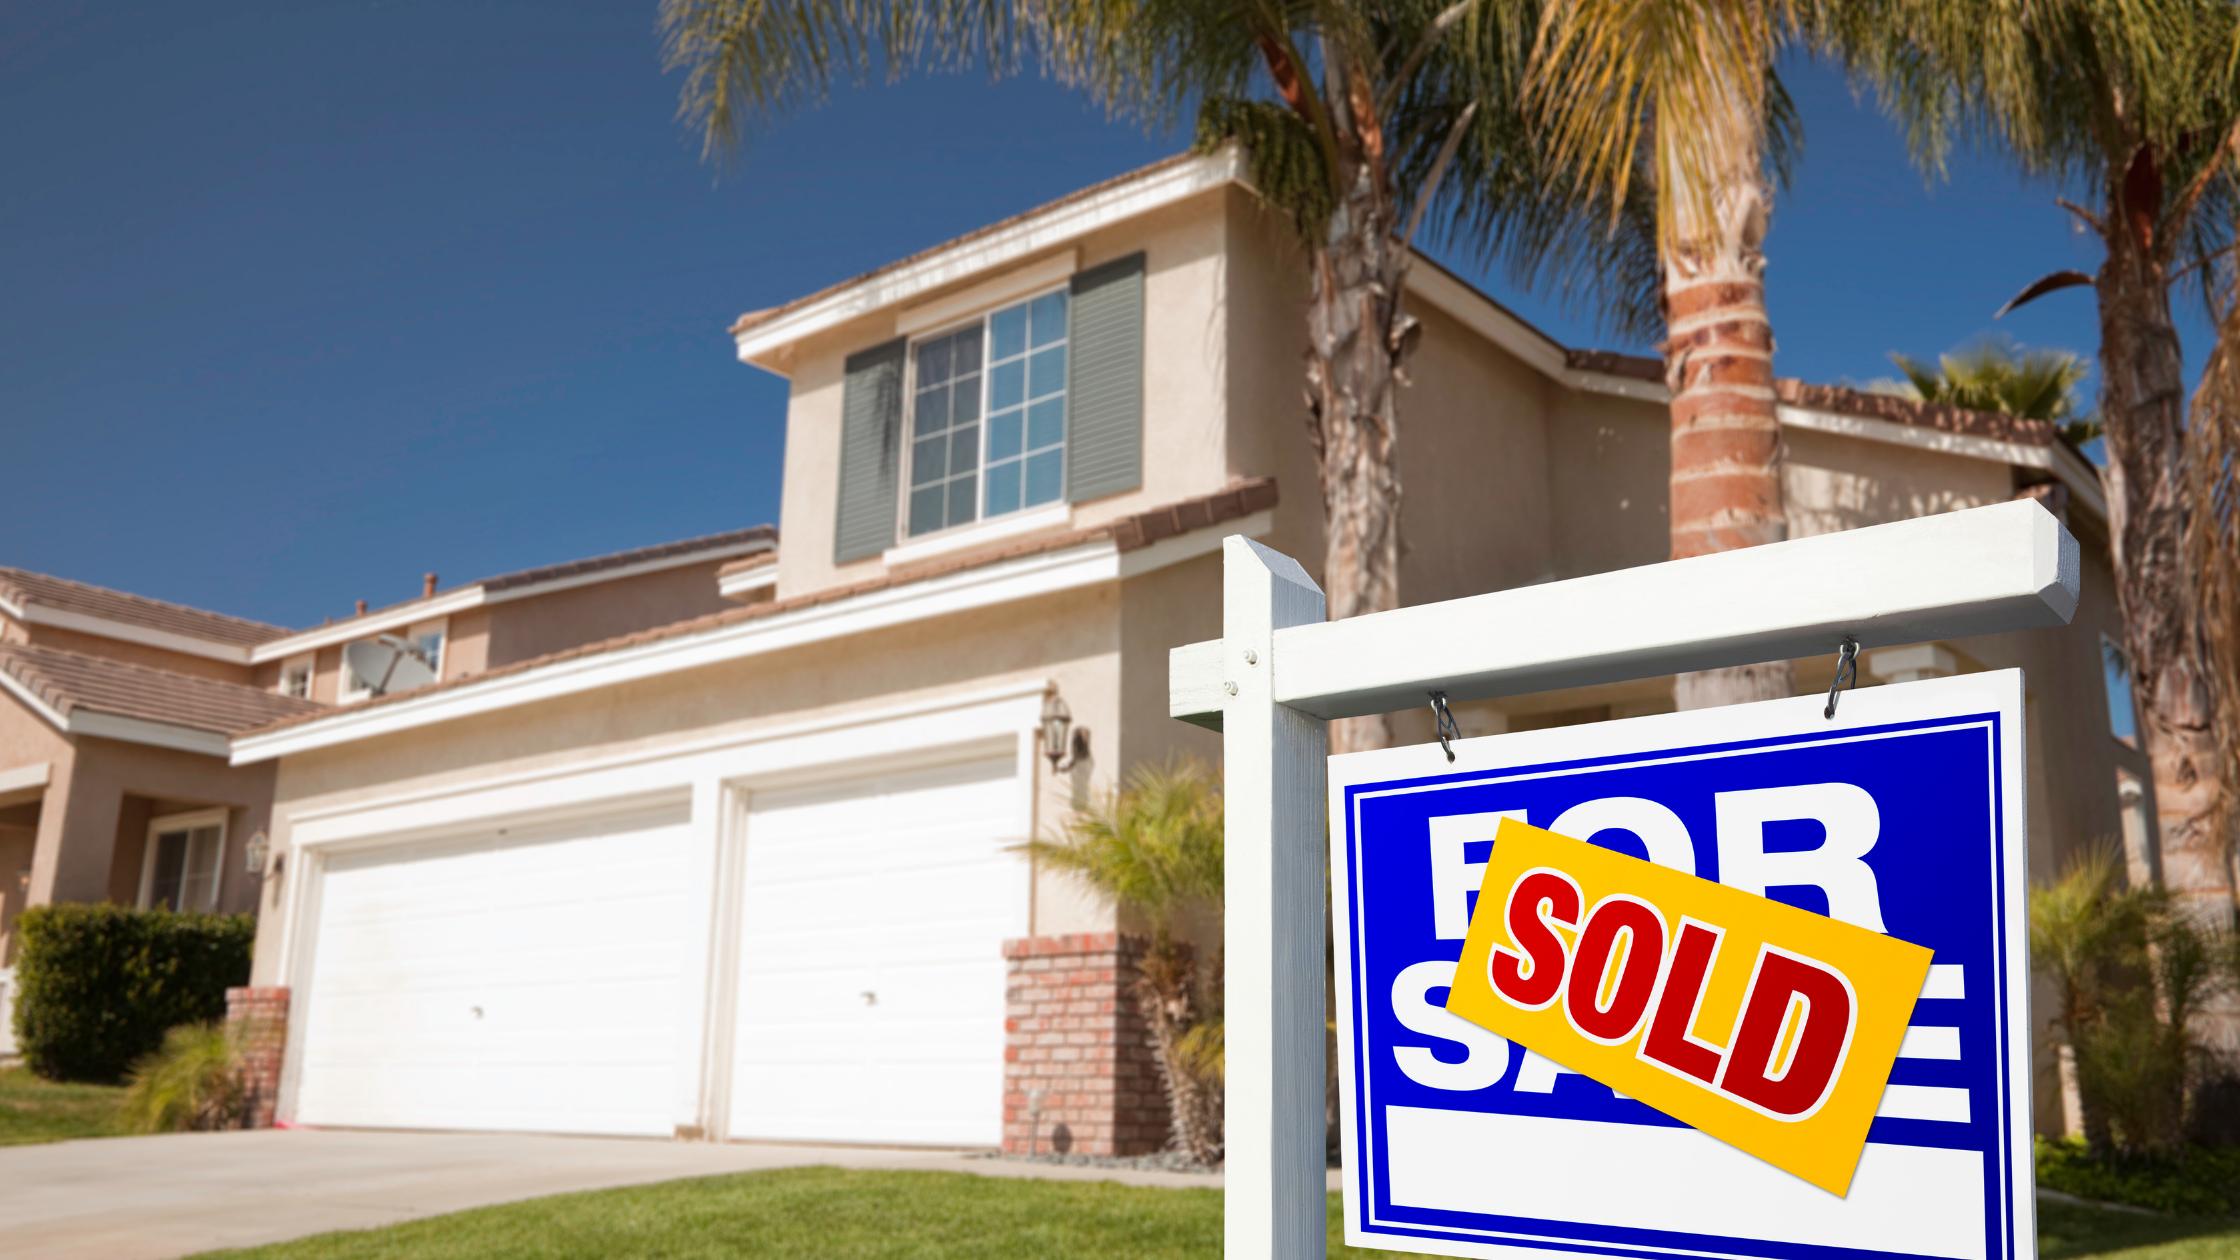 Real Estate Market Trends in 2021